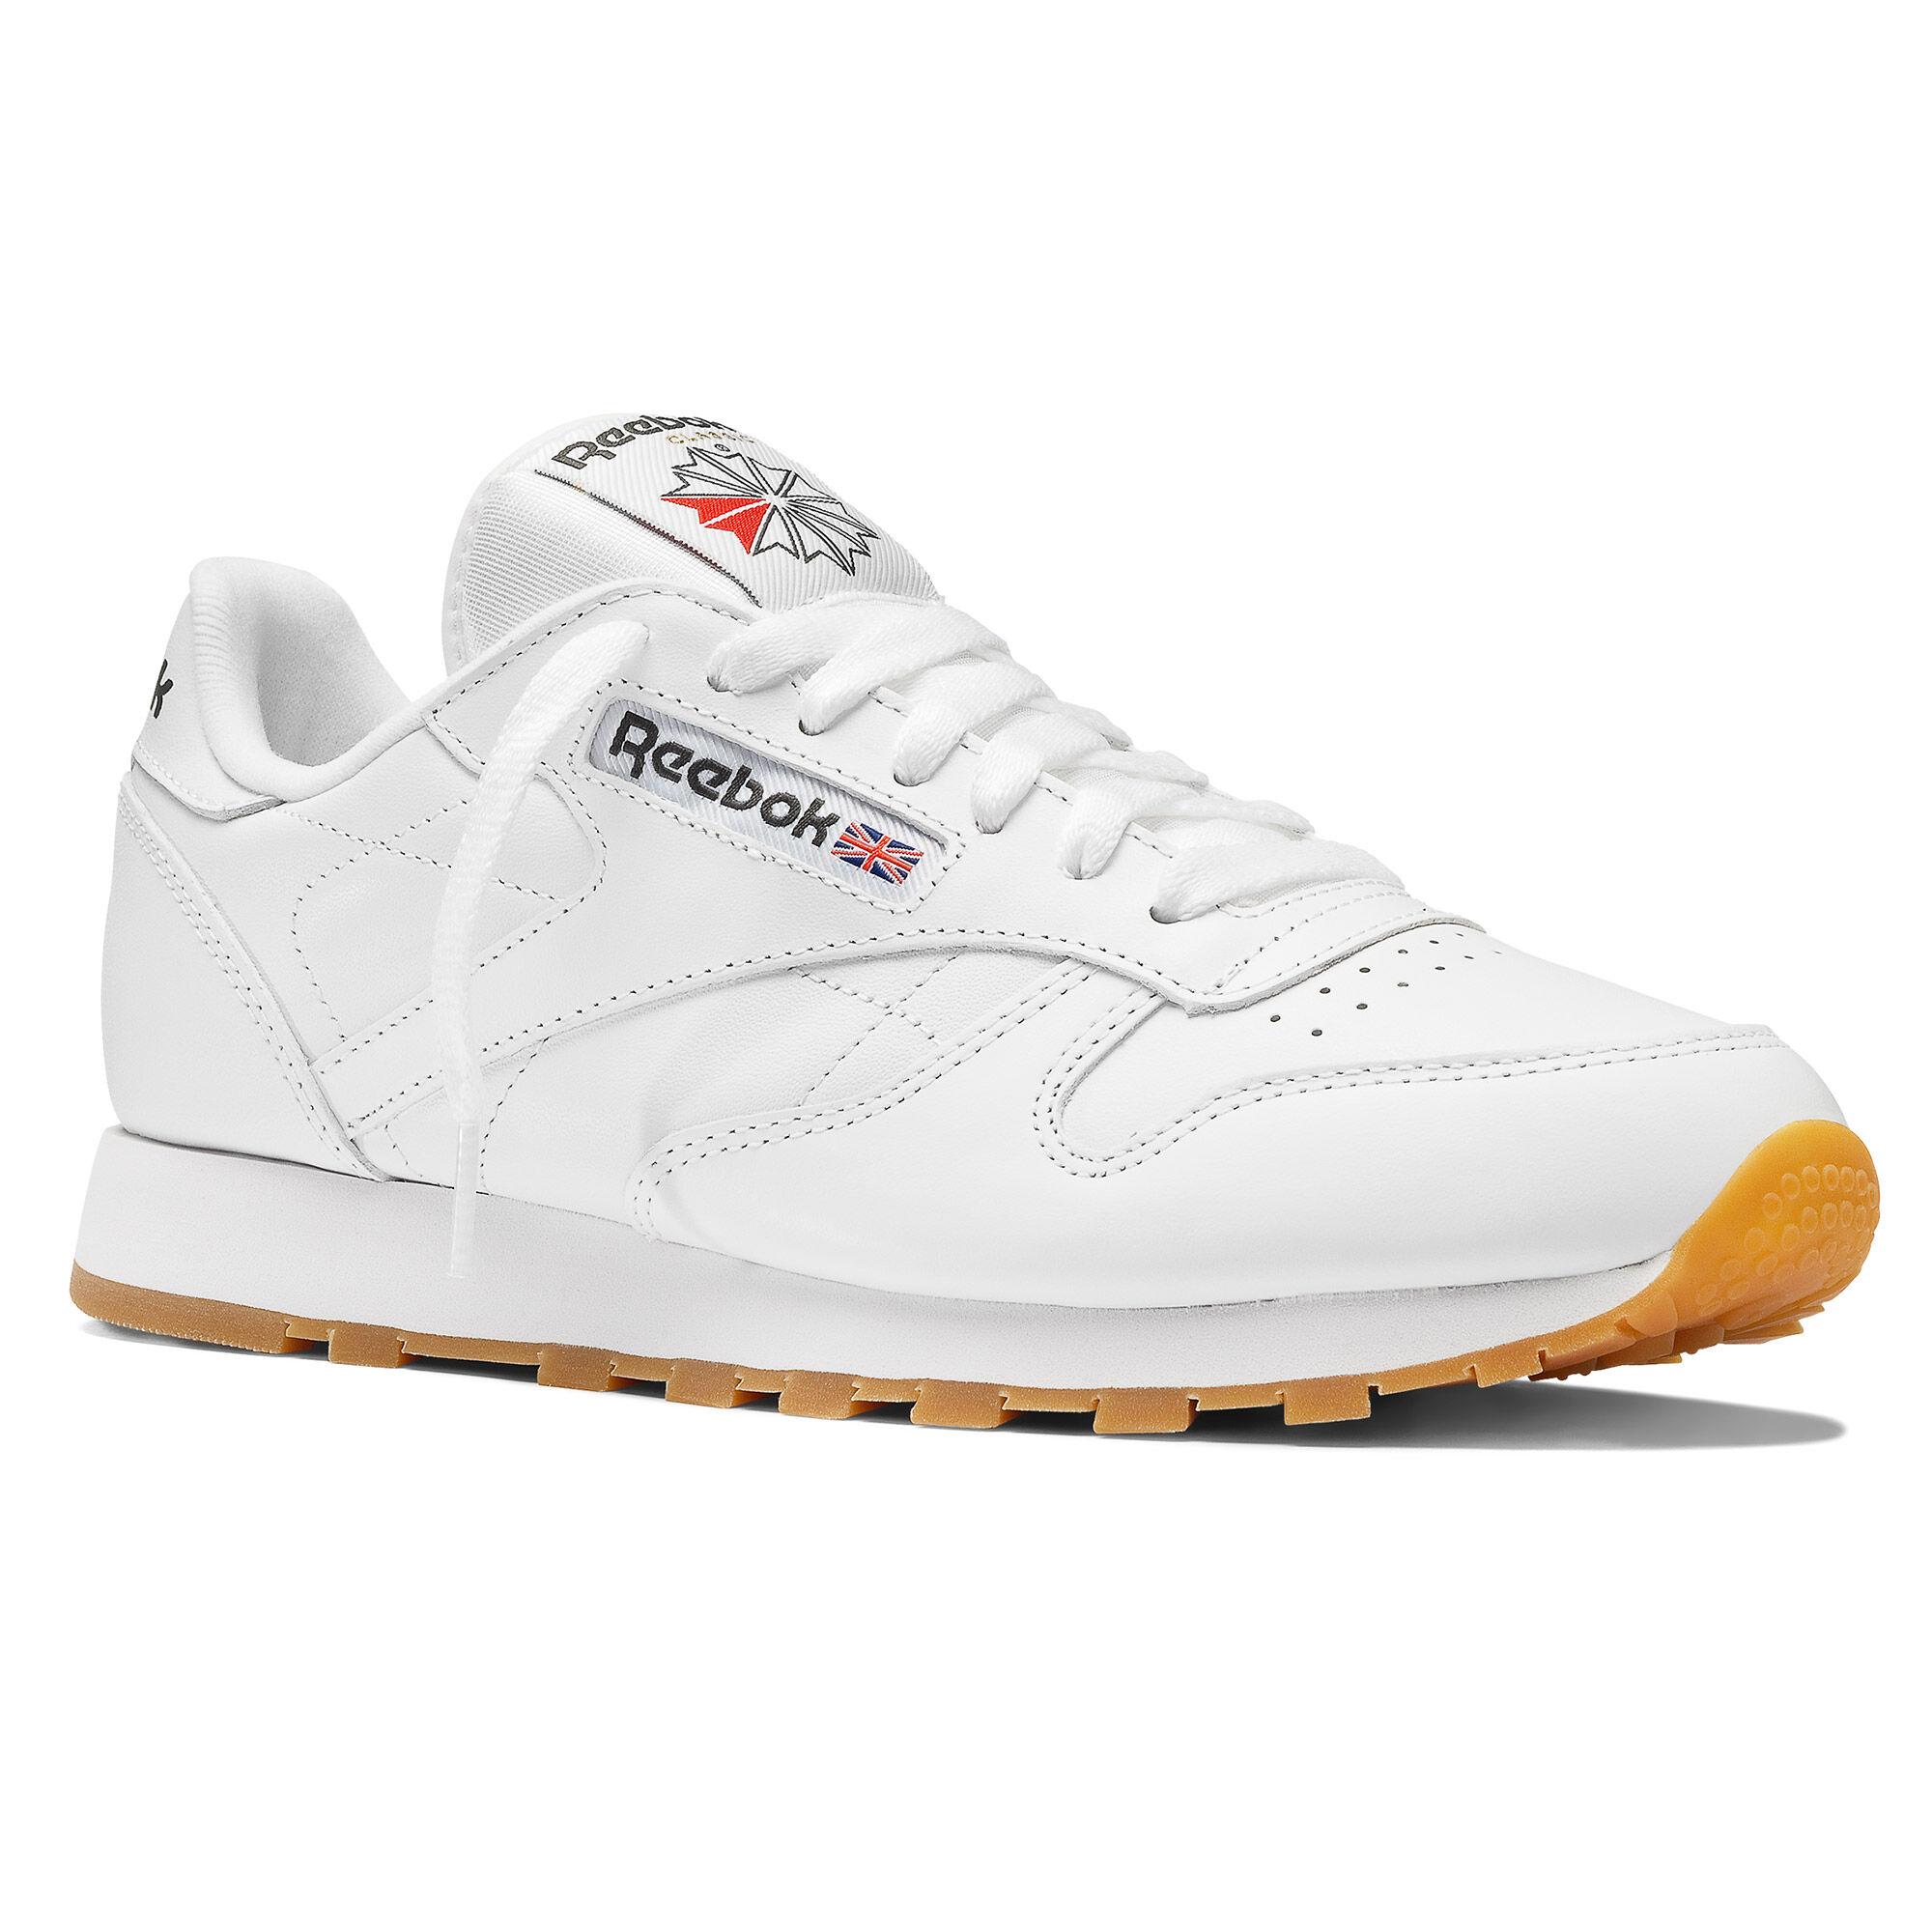 reebok classic leather blanche gum